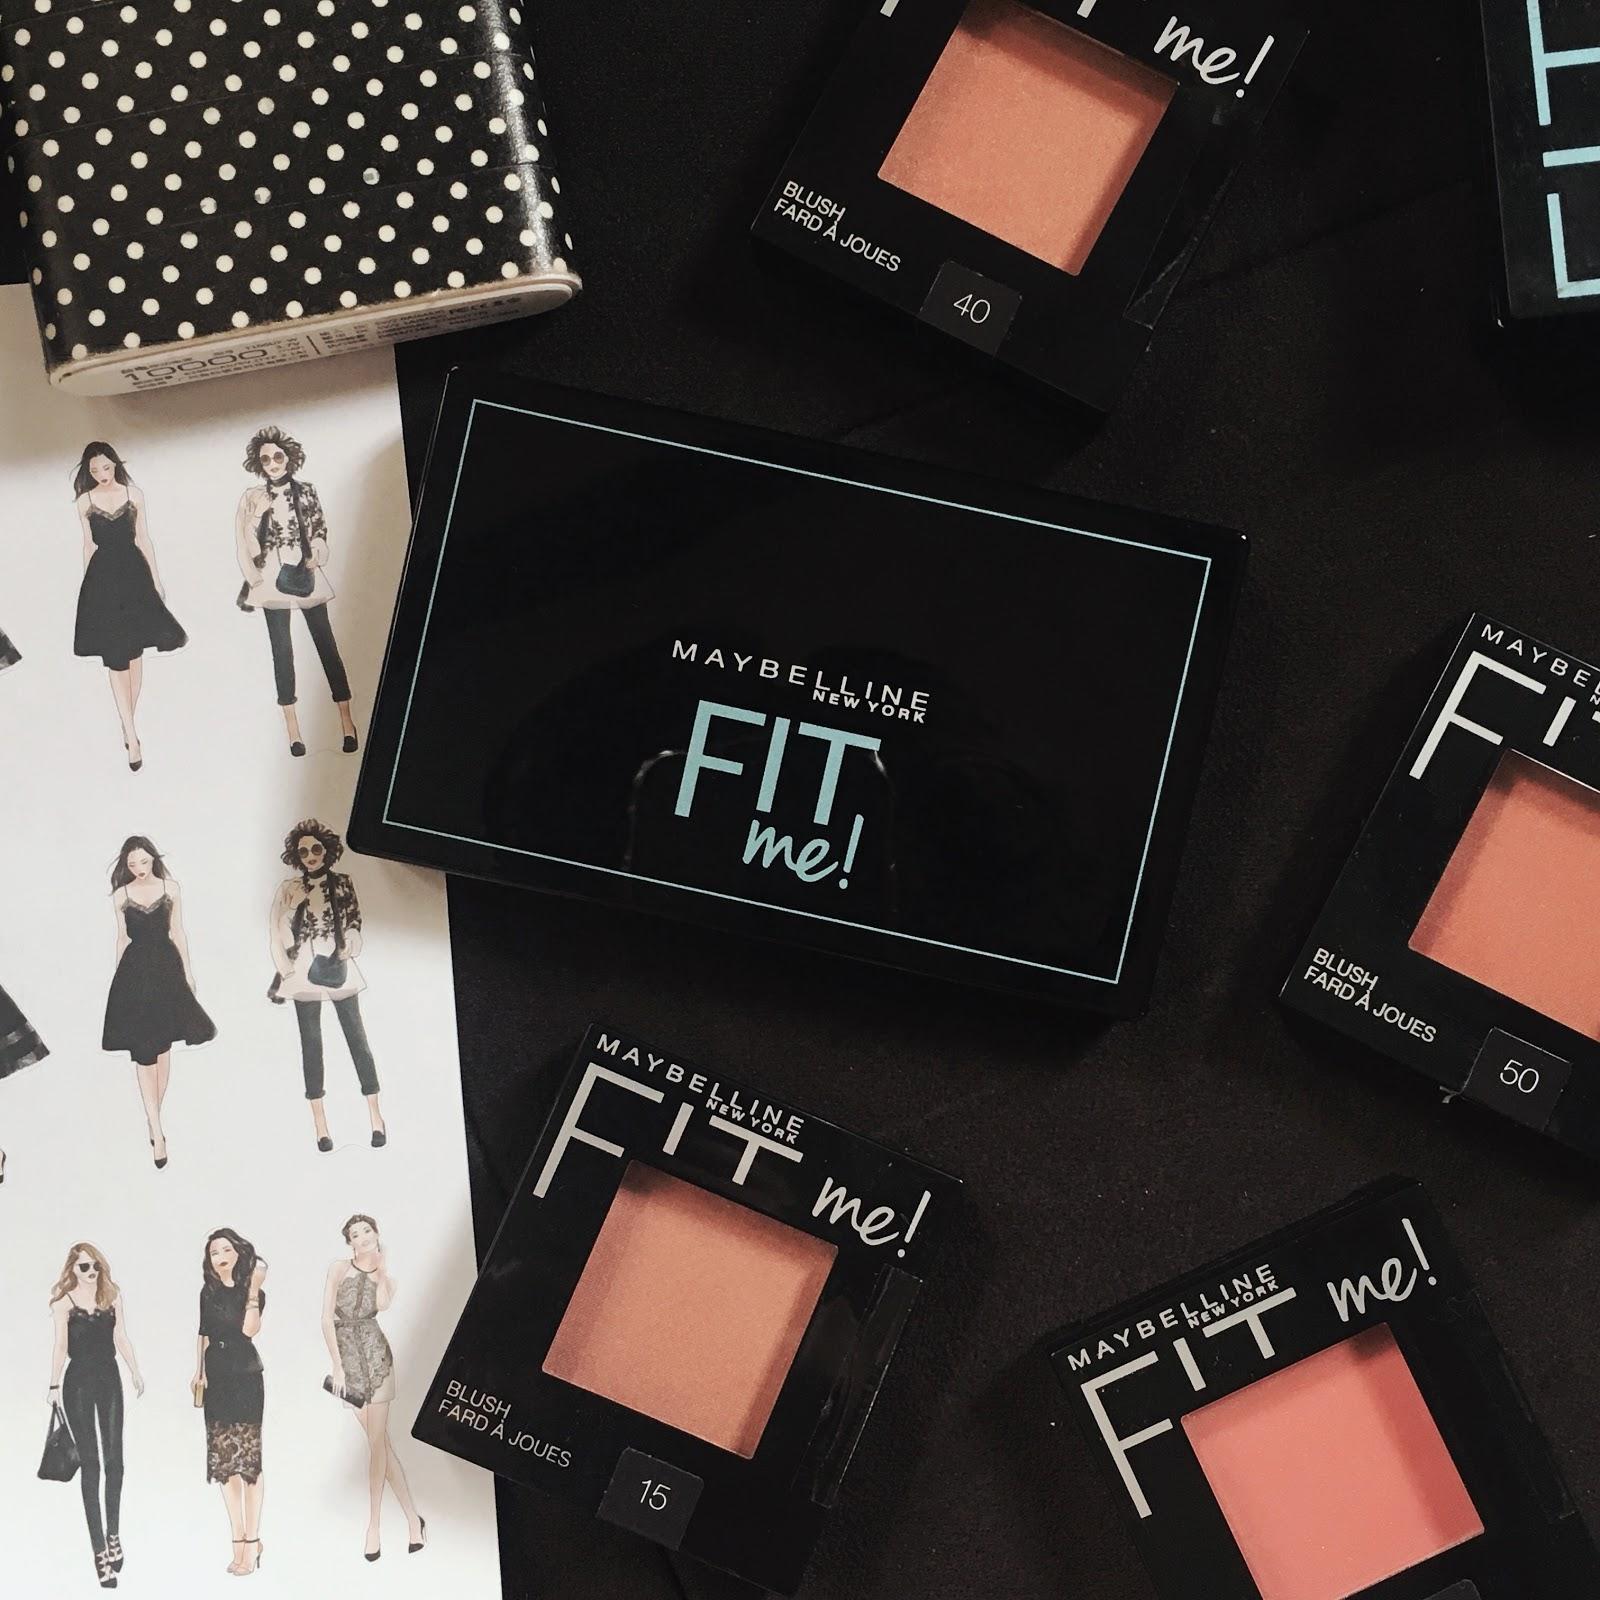 Buy Fit Me Powder Blush - Face Blush Makeup - Maybelline